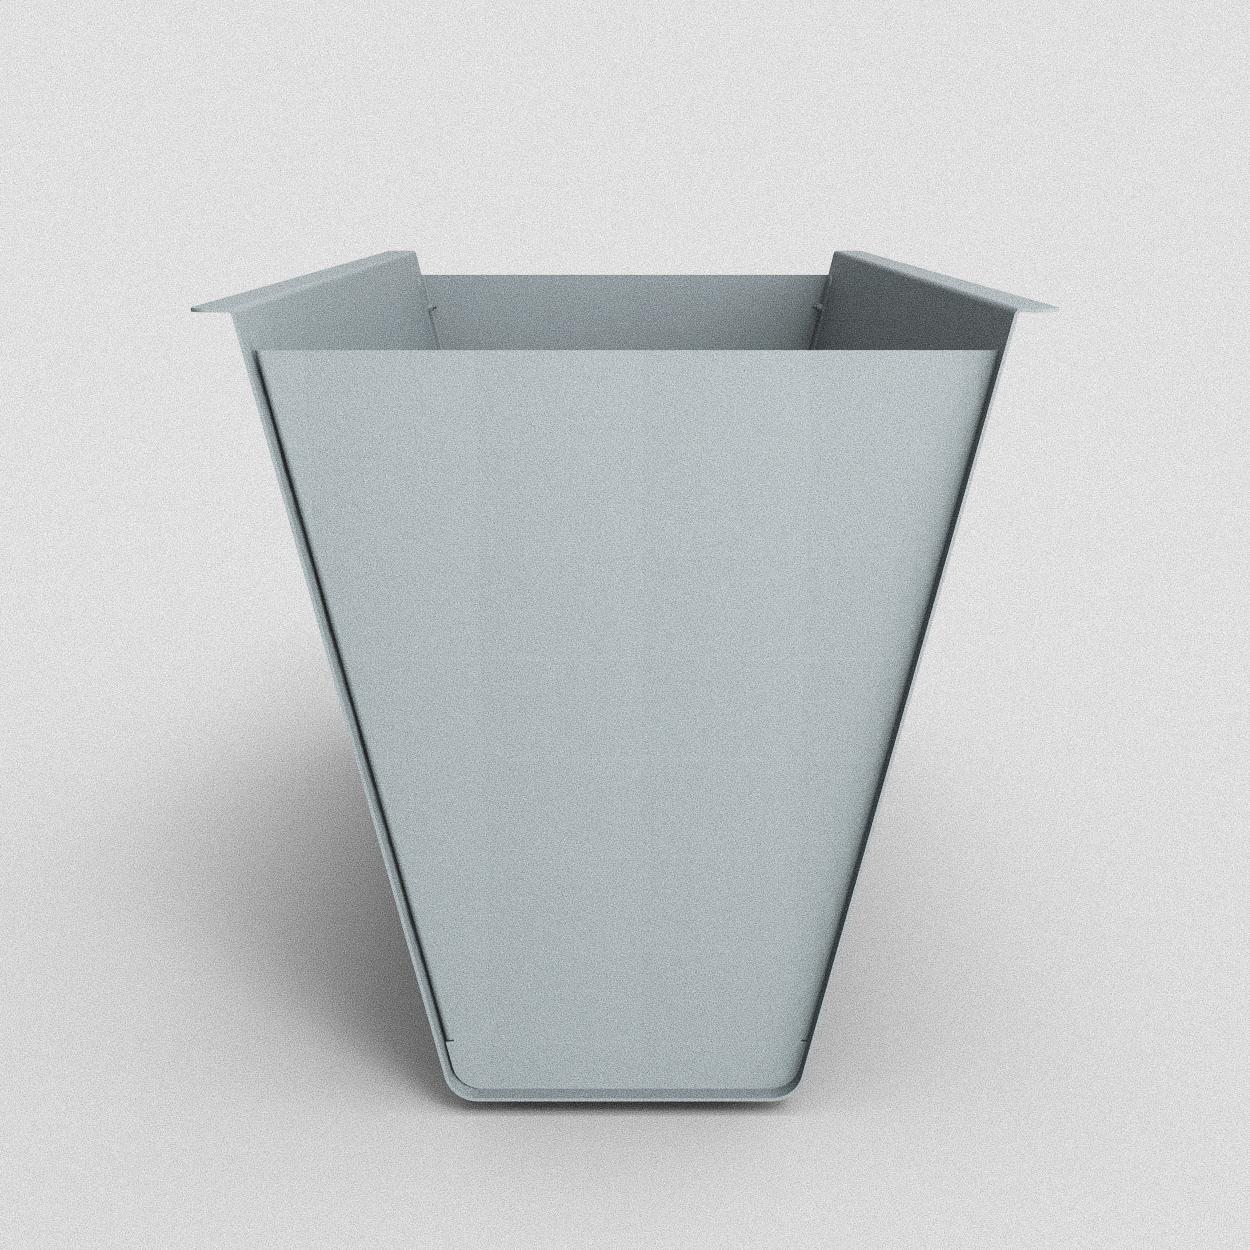 600L / Standardfärg: Granit